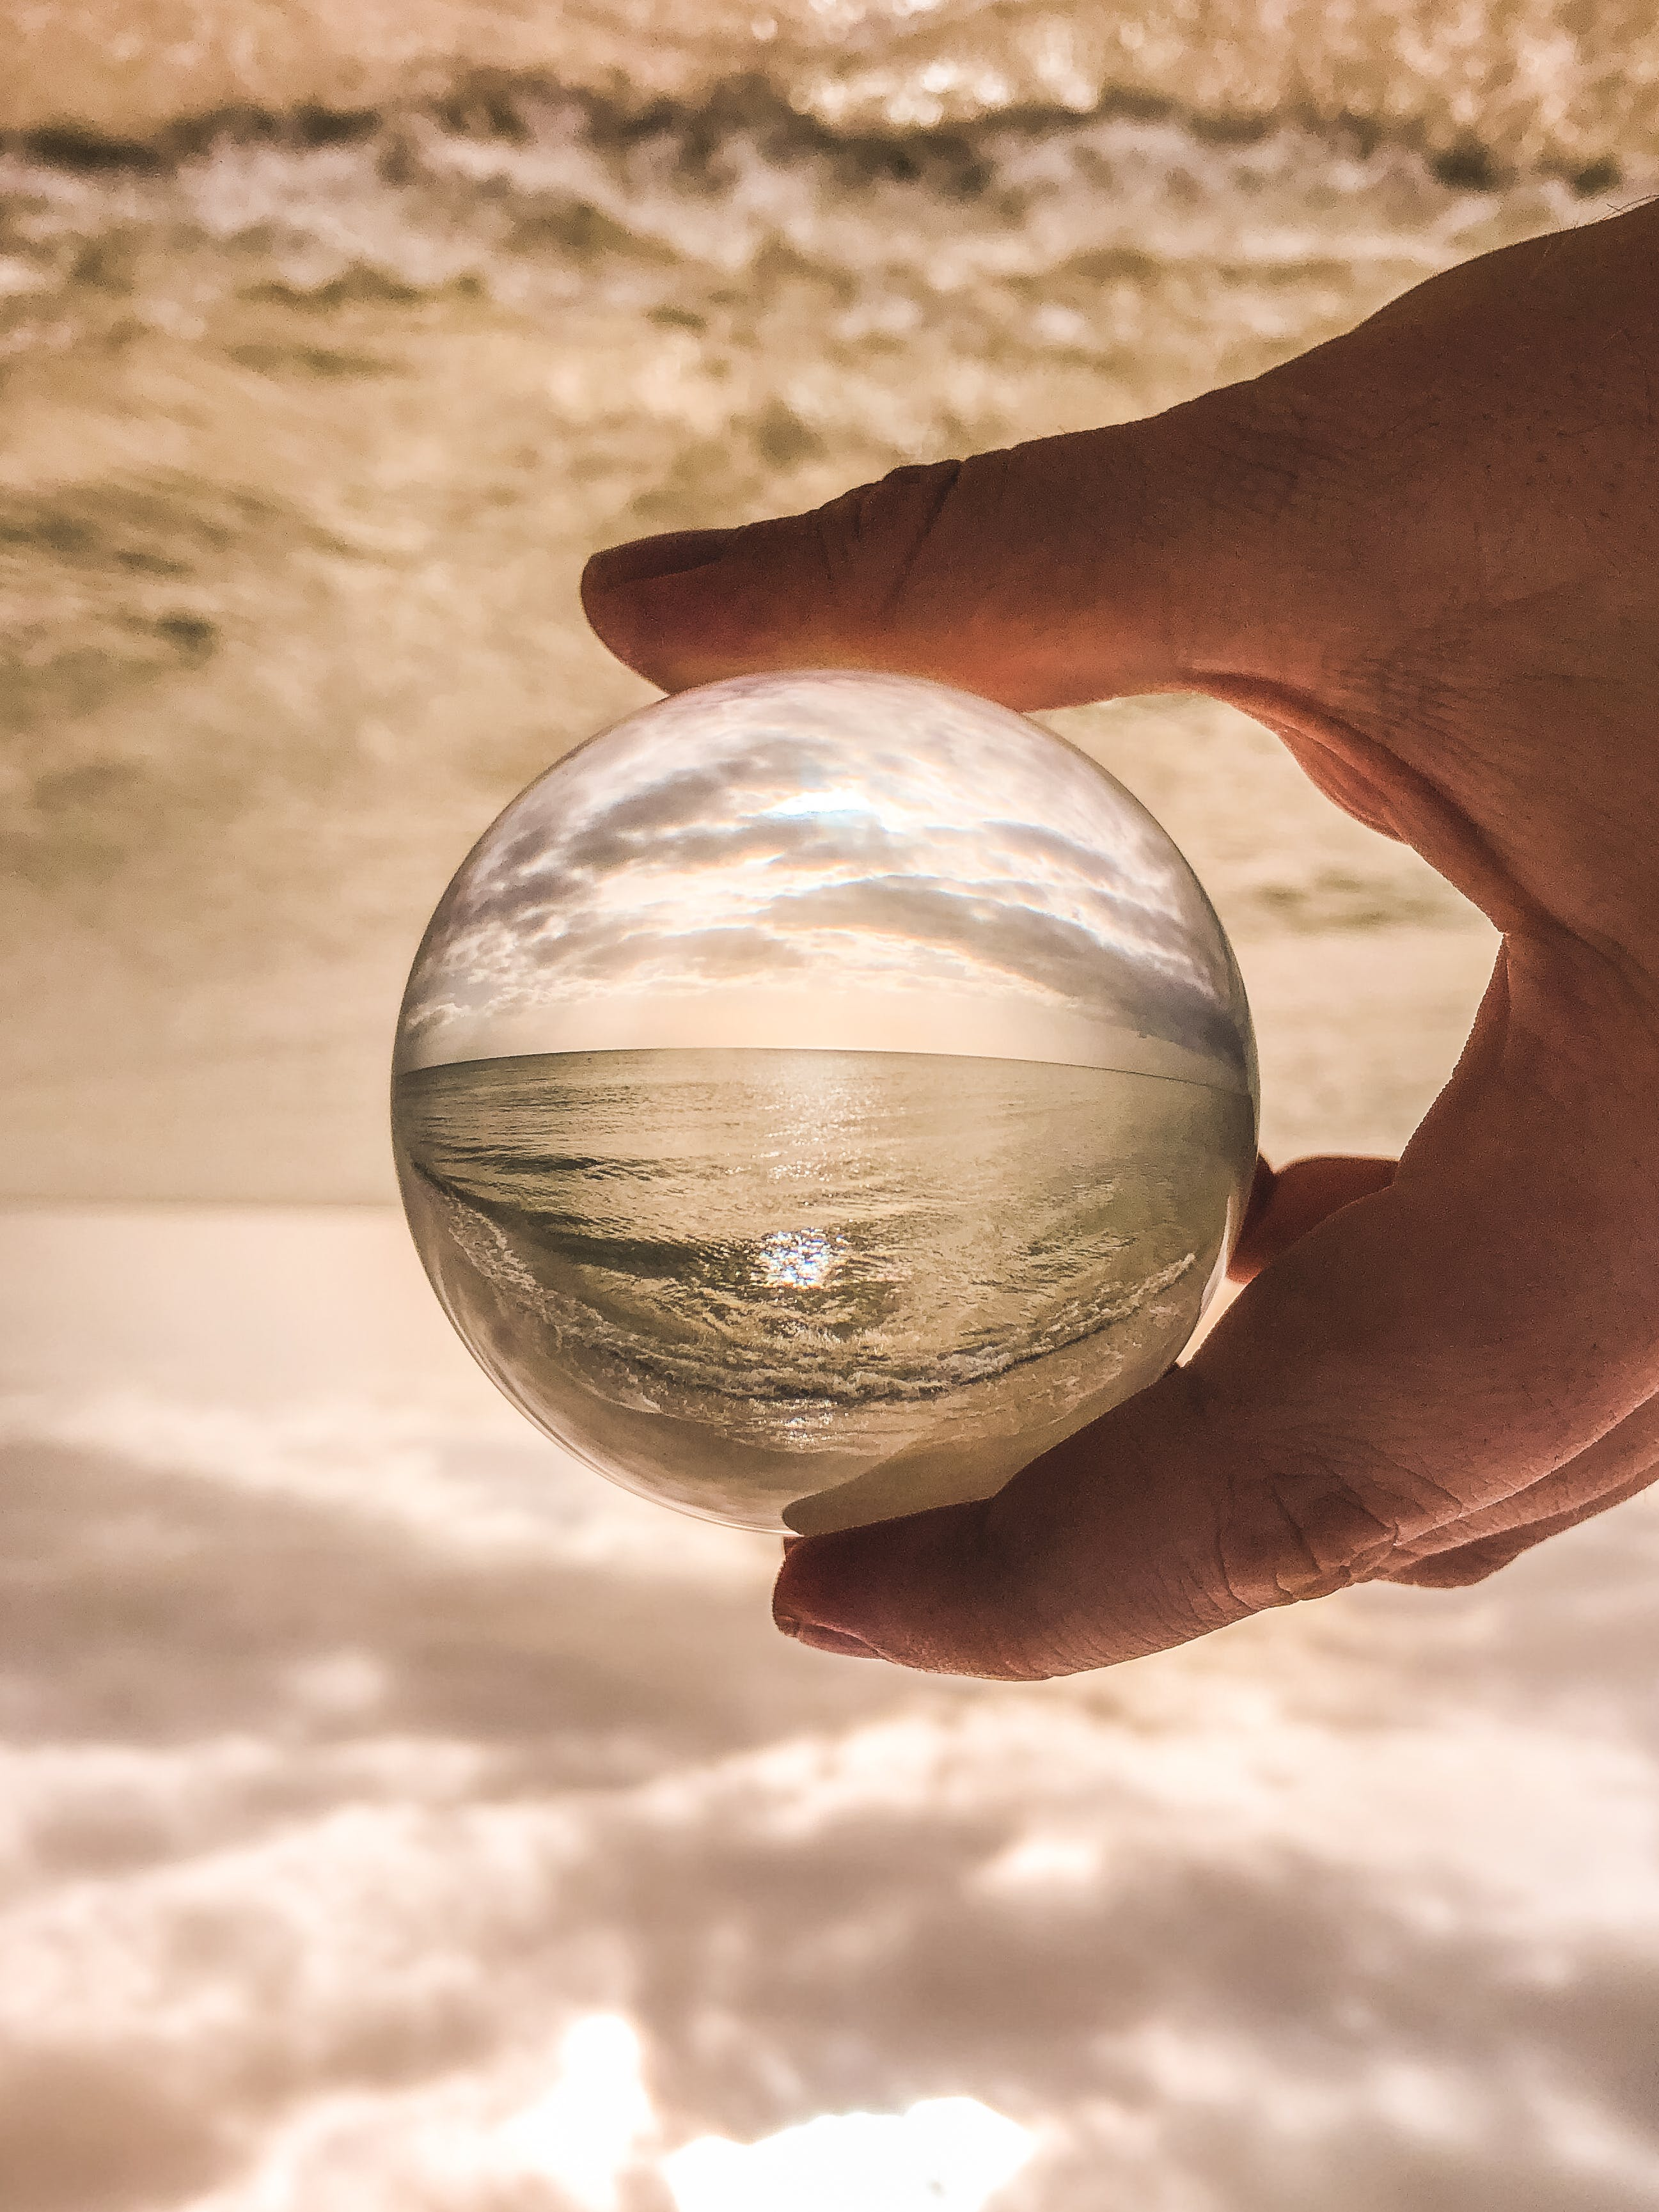 Kostnadsfri bild av hand, hav, havsstrand, makro